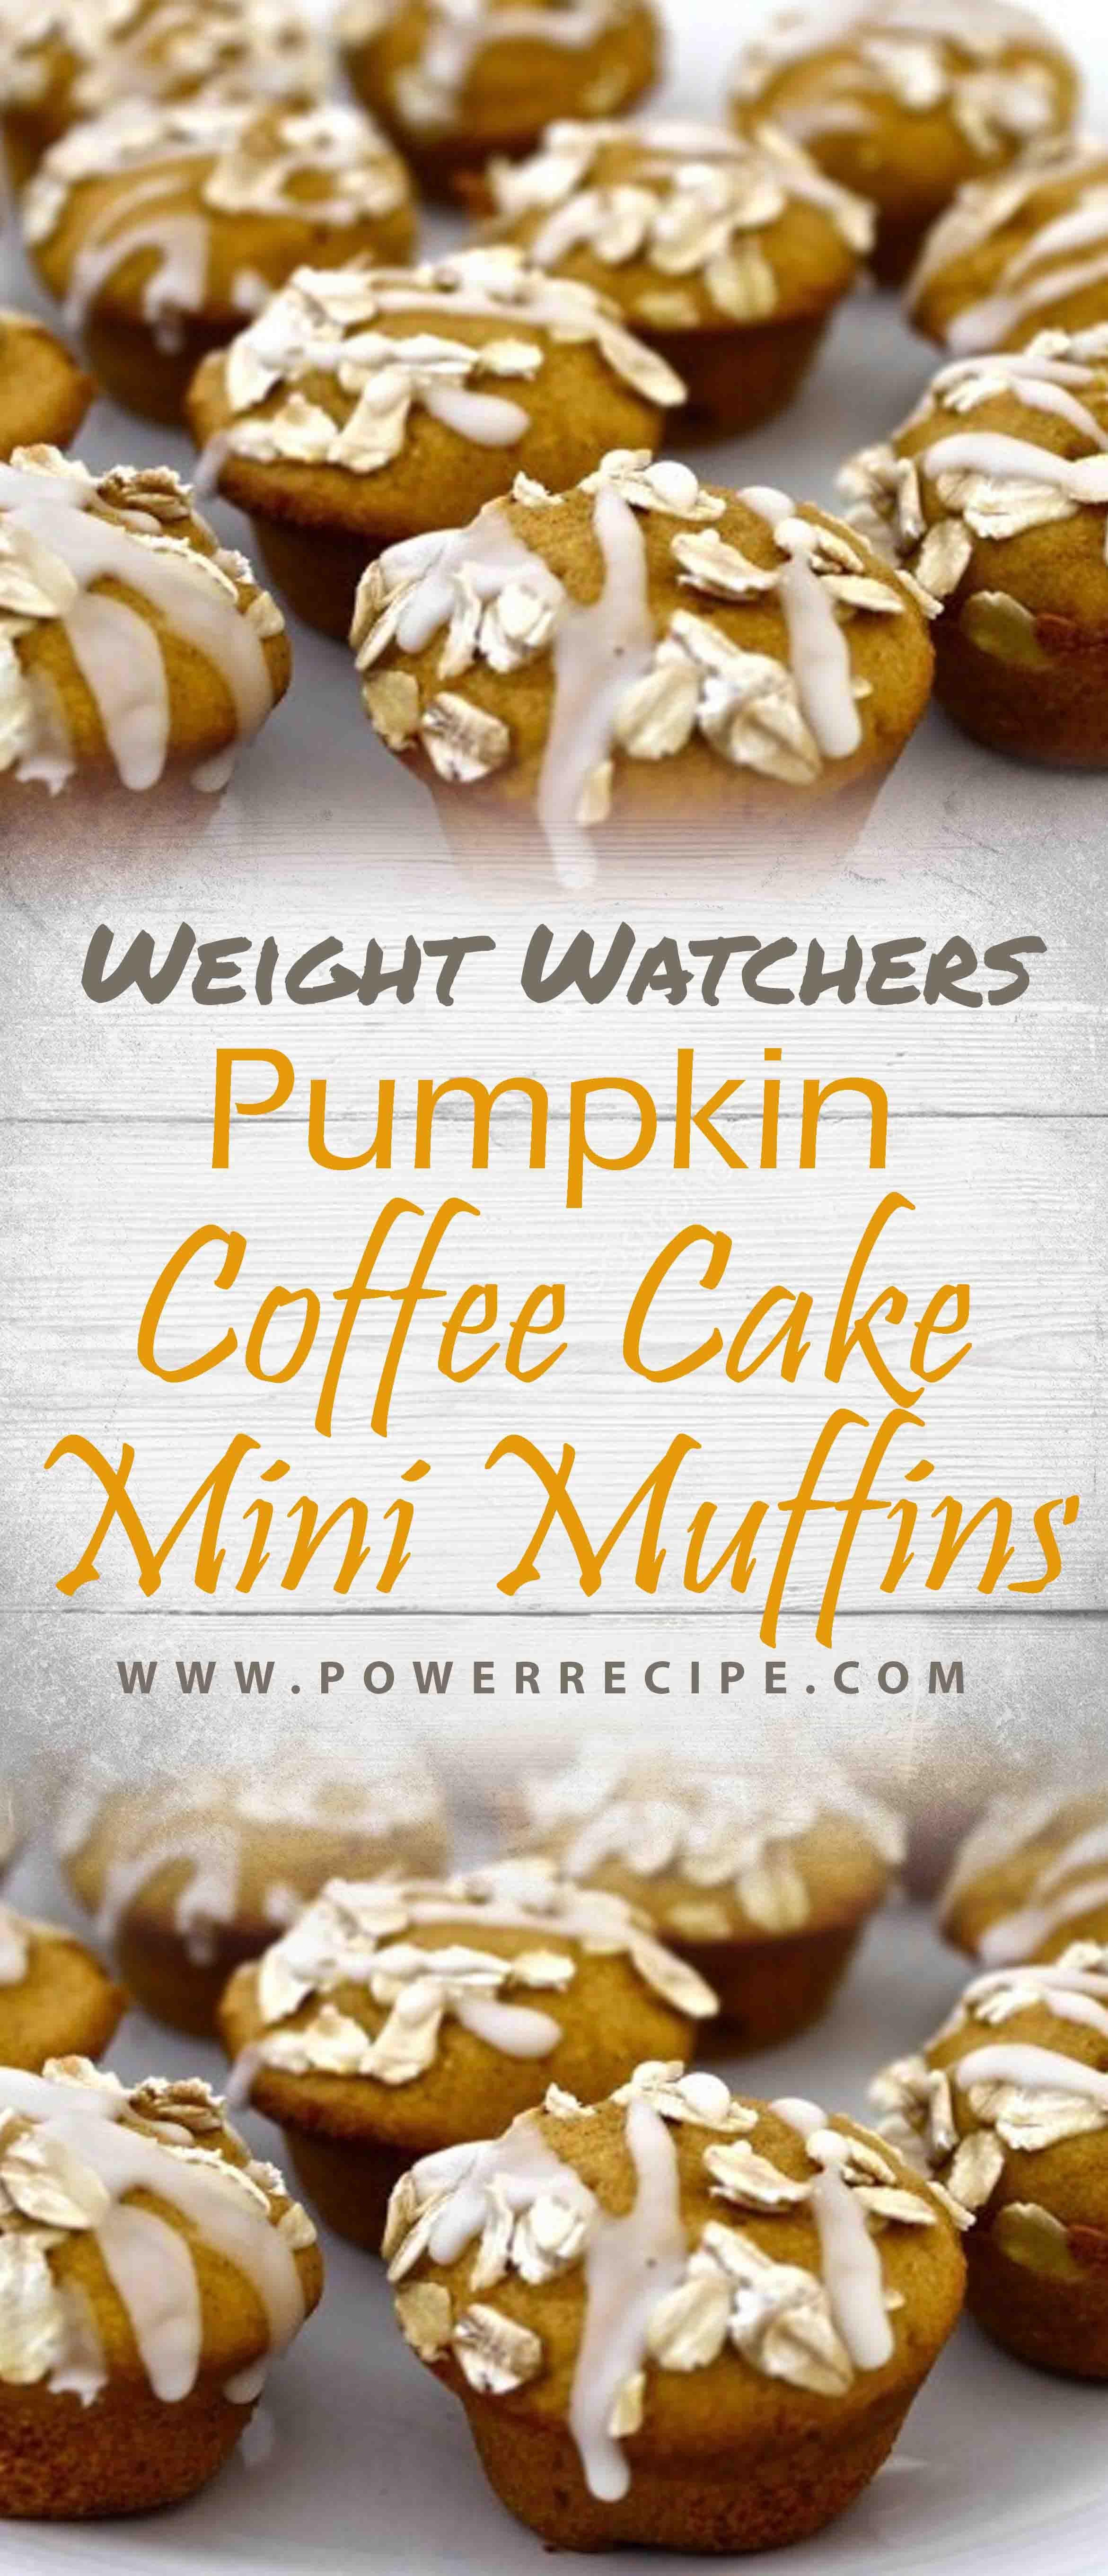 Skinny Pumpkin Coffee Cake Mini Muffins Pumpkin coffee